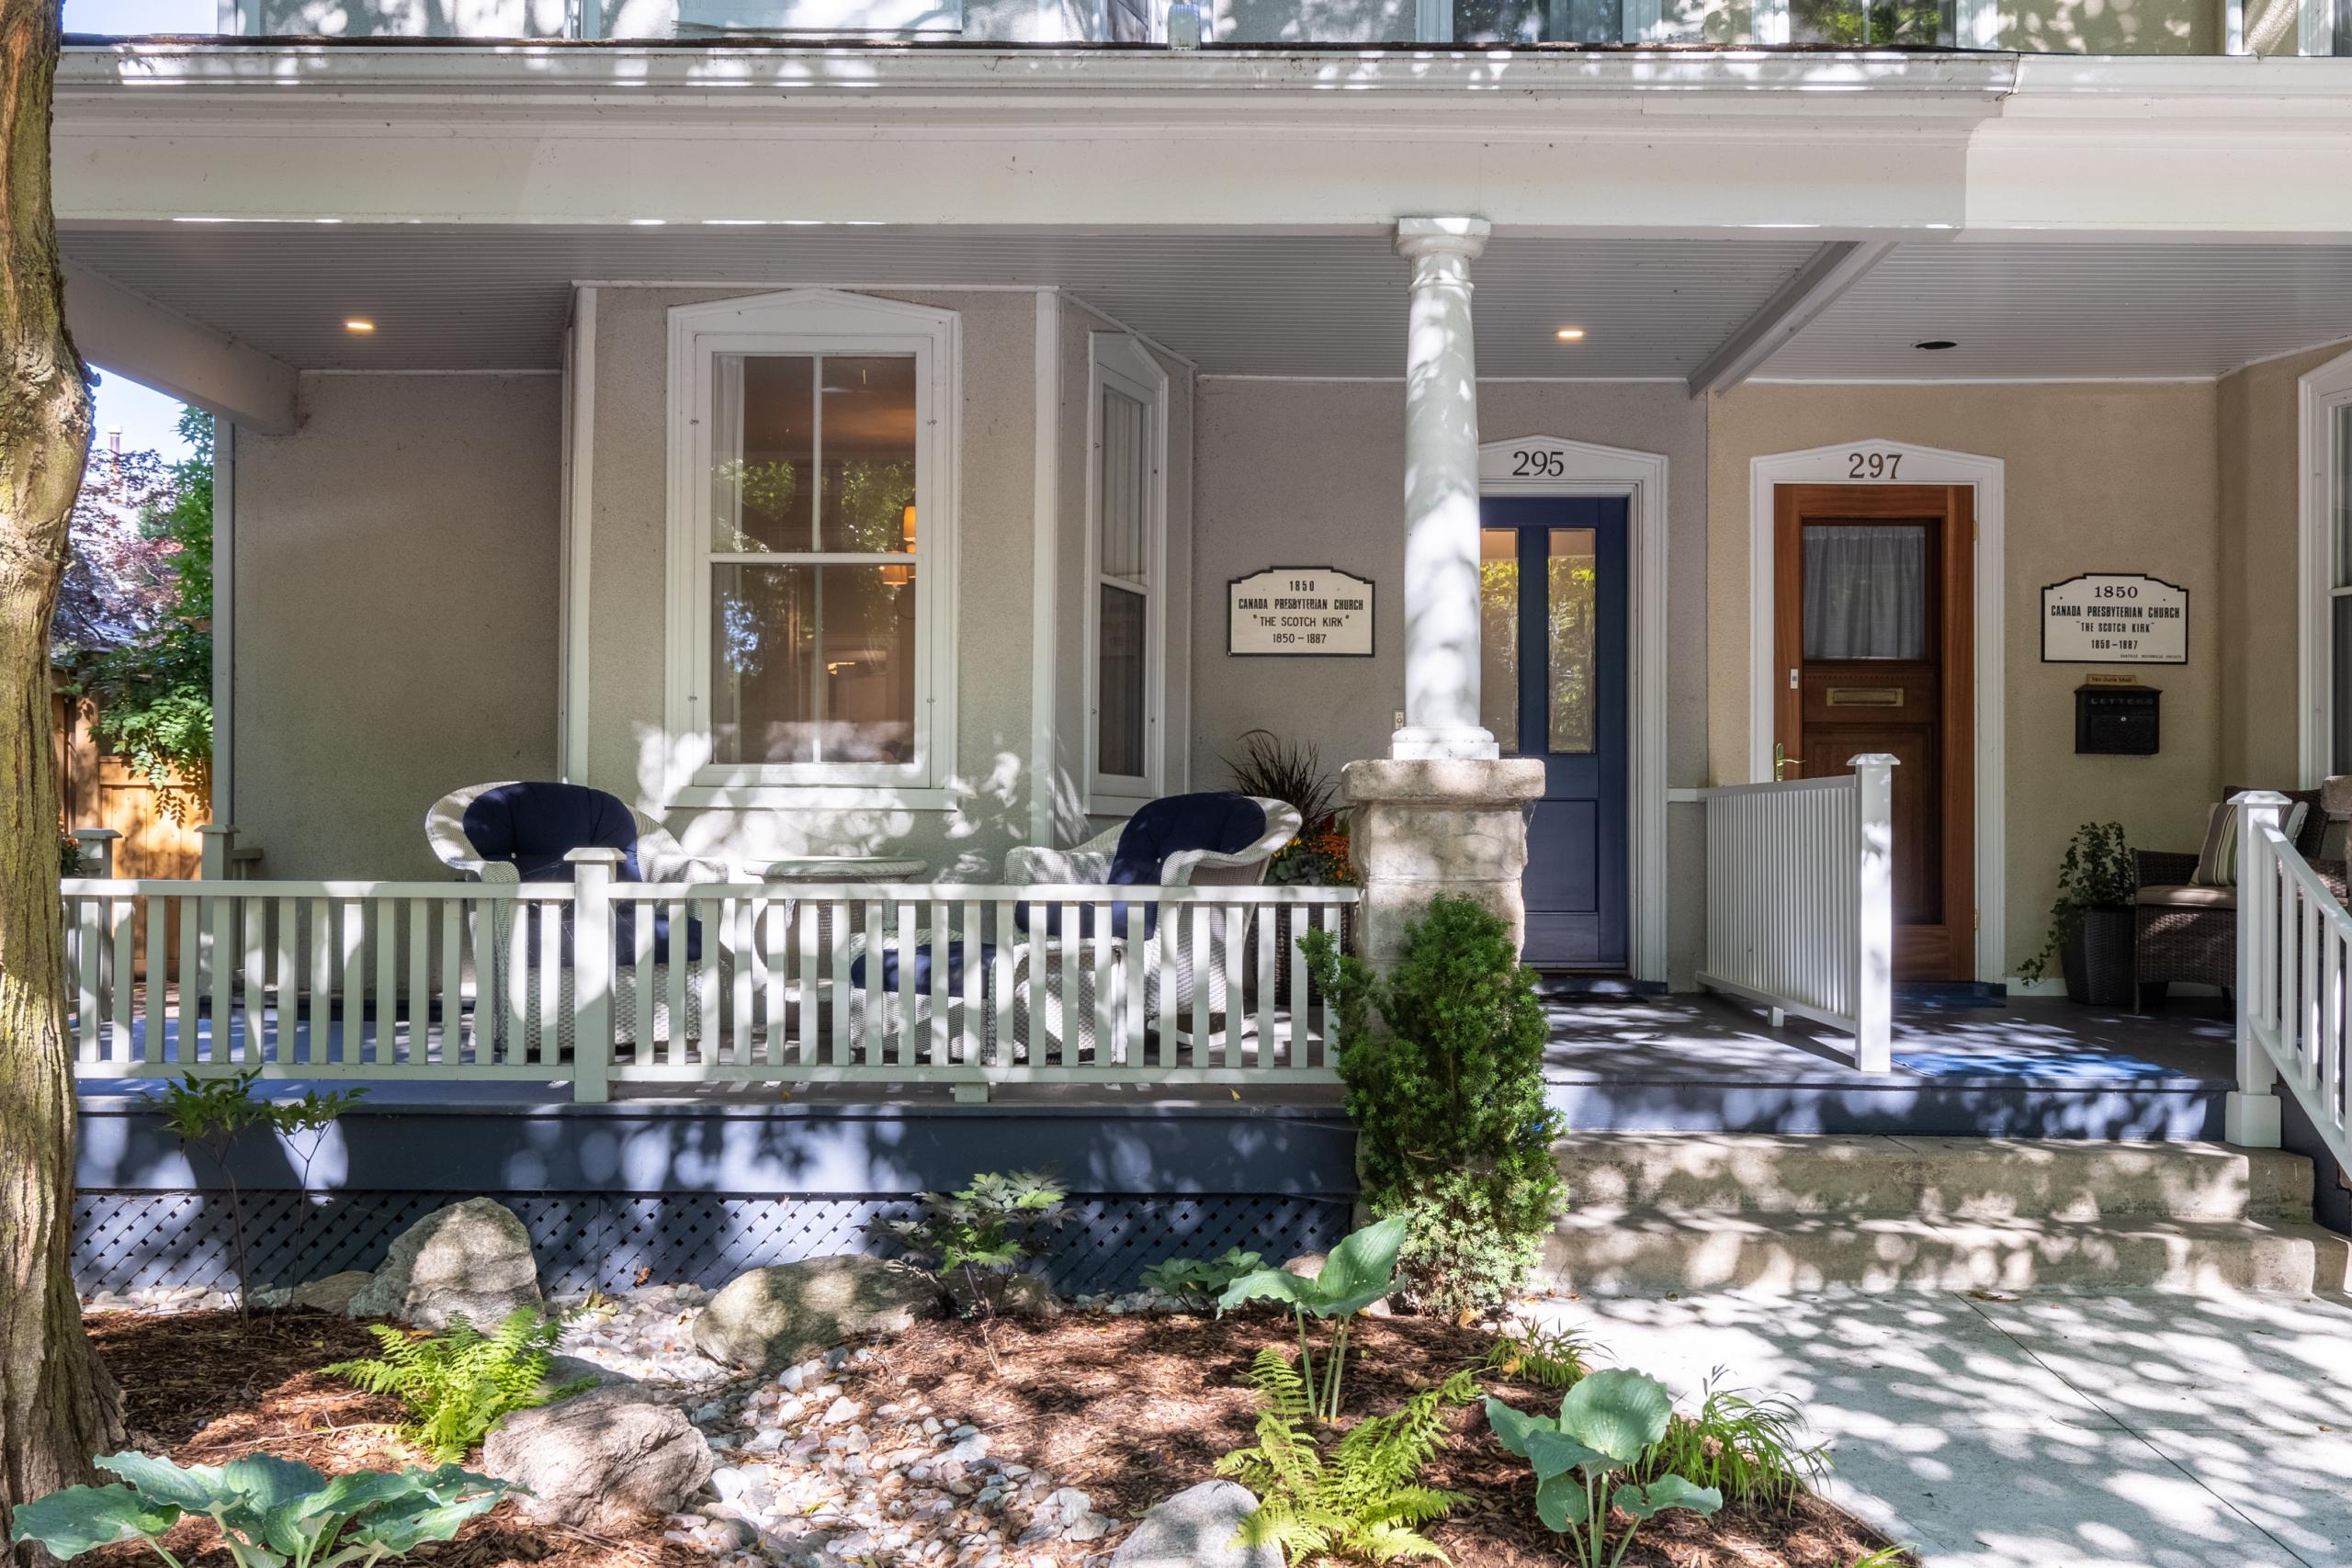 Backyard featured at 295 William Street, Oakville. Alex Irish & Associates